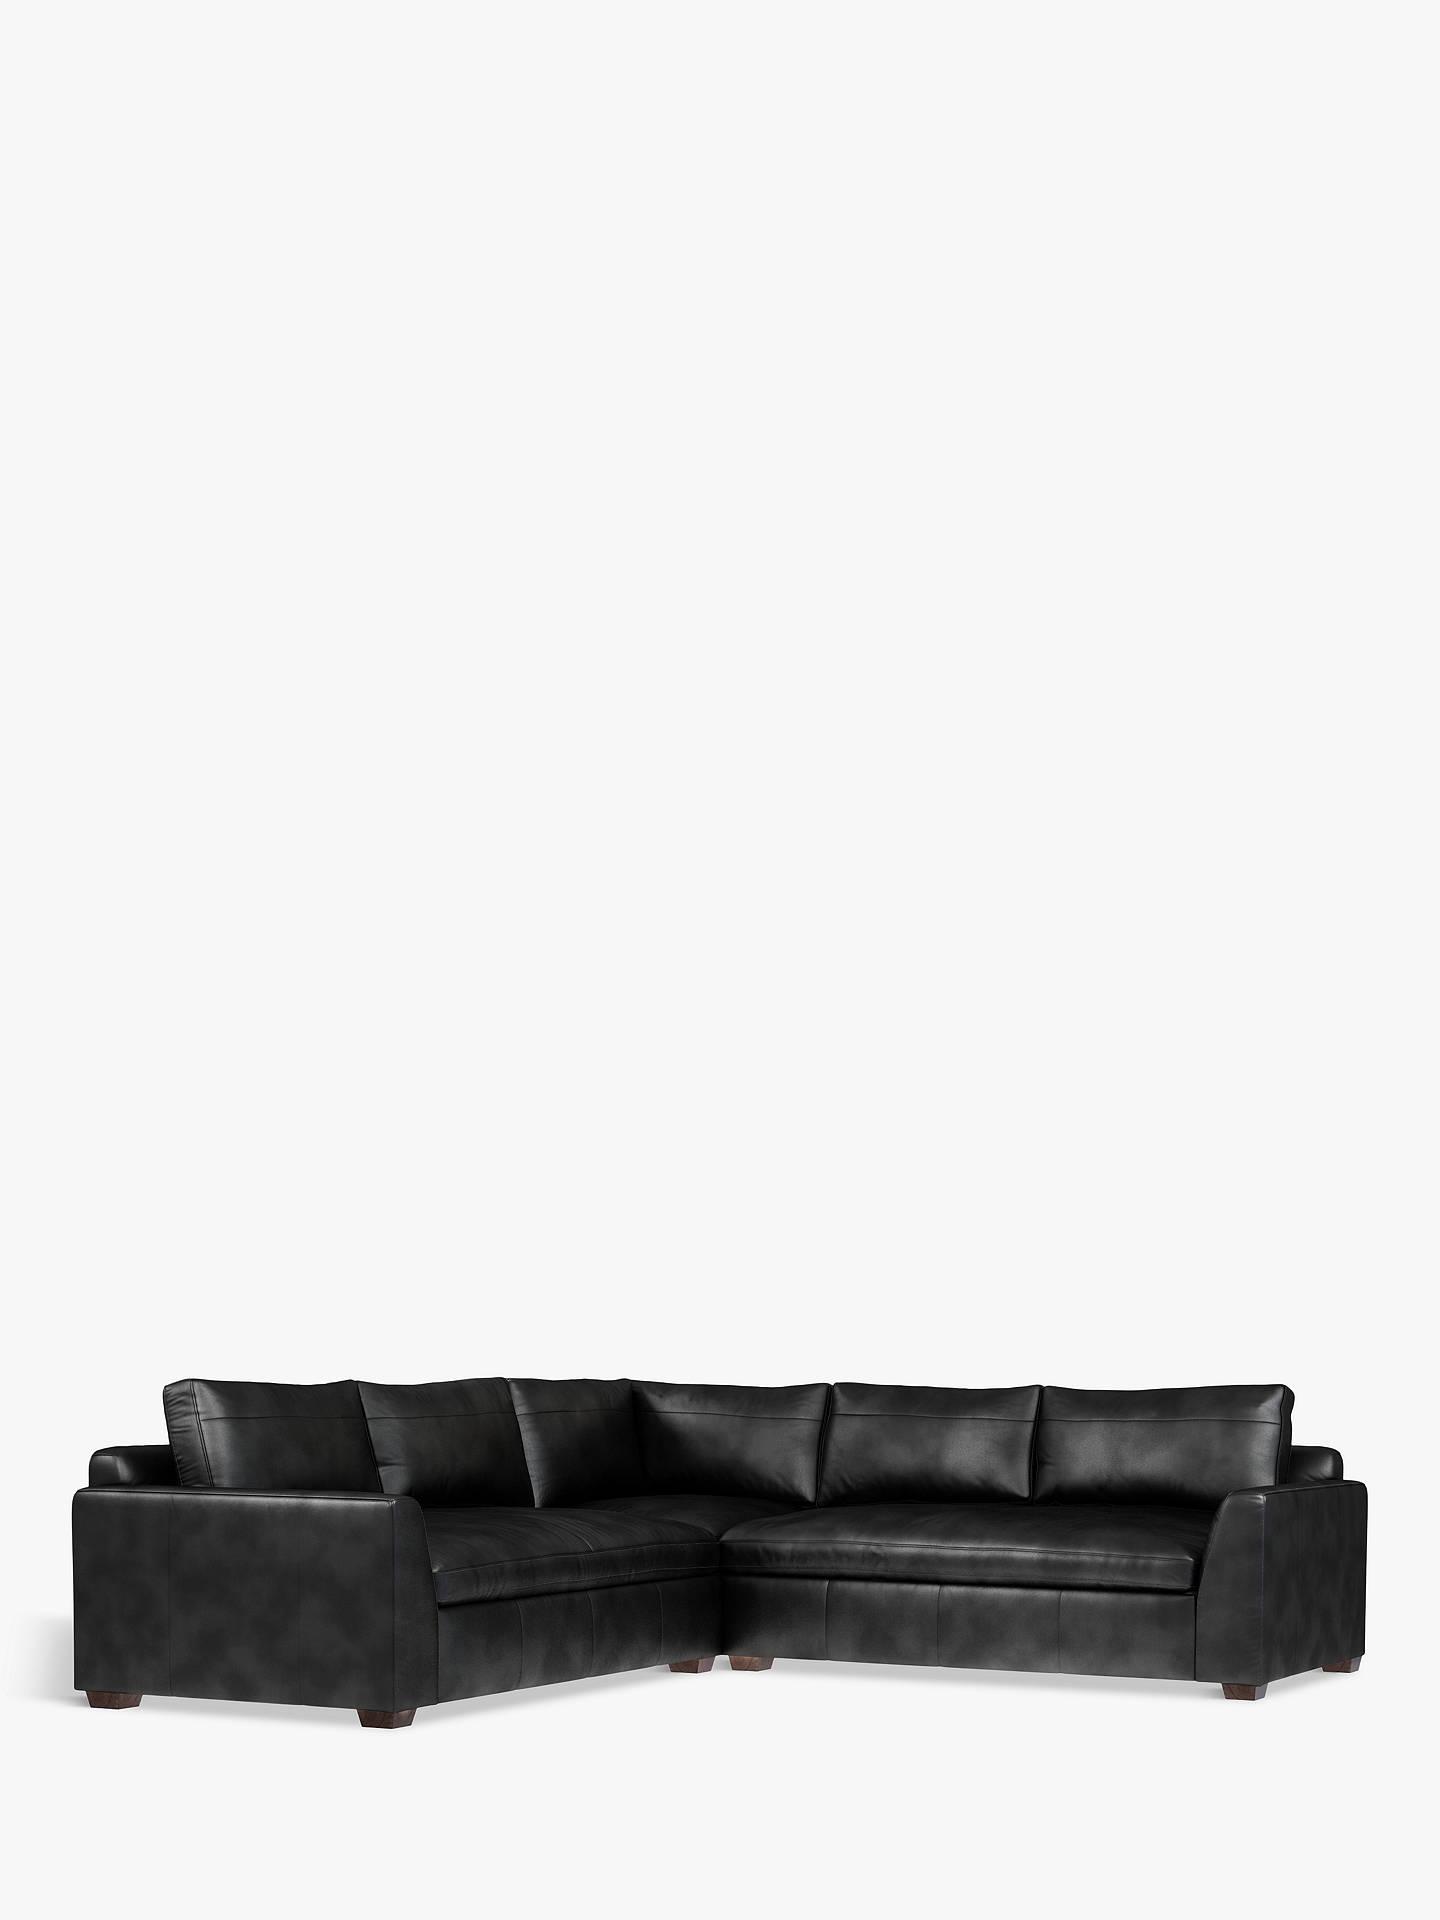 Terrific John Lewis Partners Tortona Leather Corner Sofa Contempo Theyellowbook Wood Chair Design Ideas Theyellowbookinfo